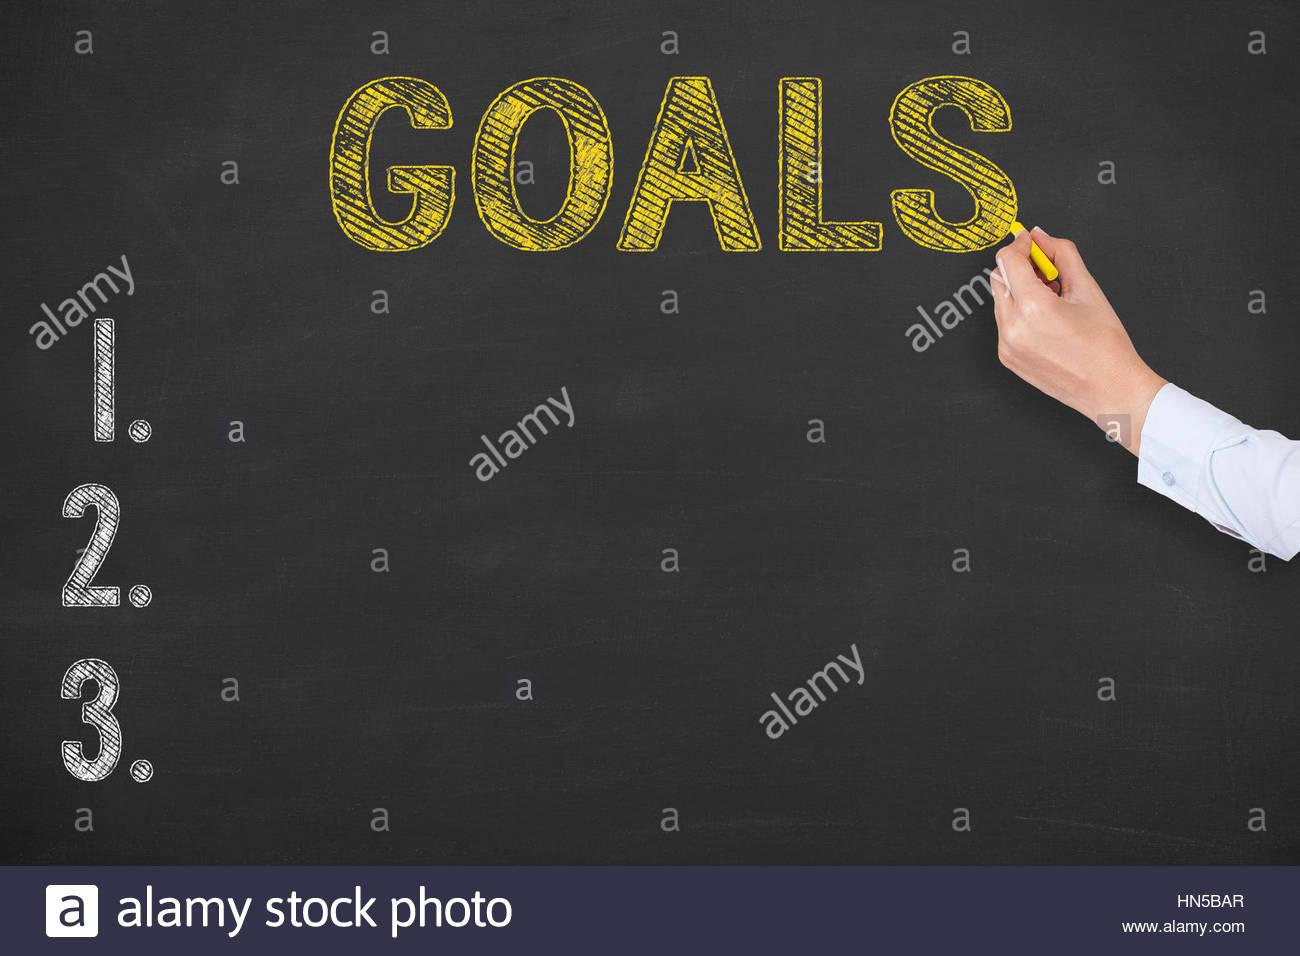 Goal List on Chalkboard Background - Stock Image